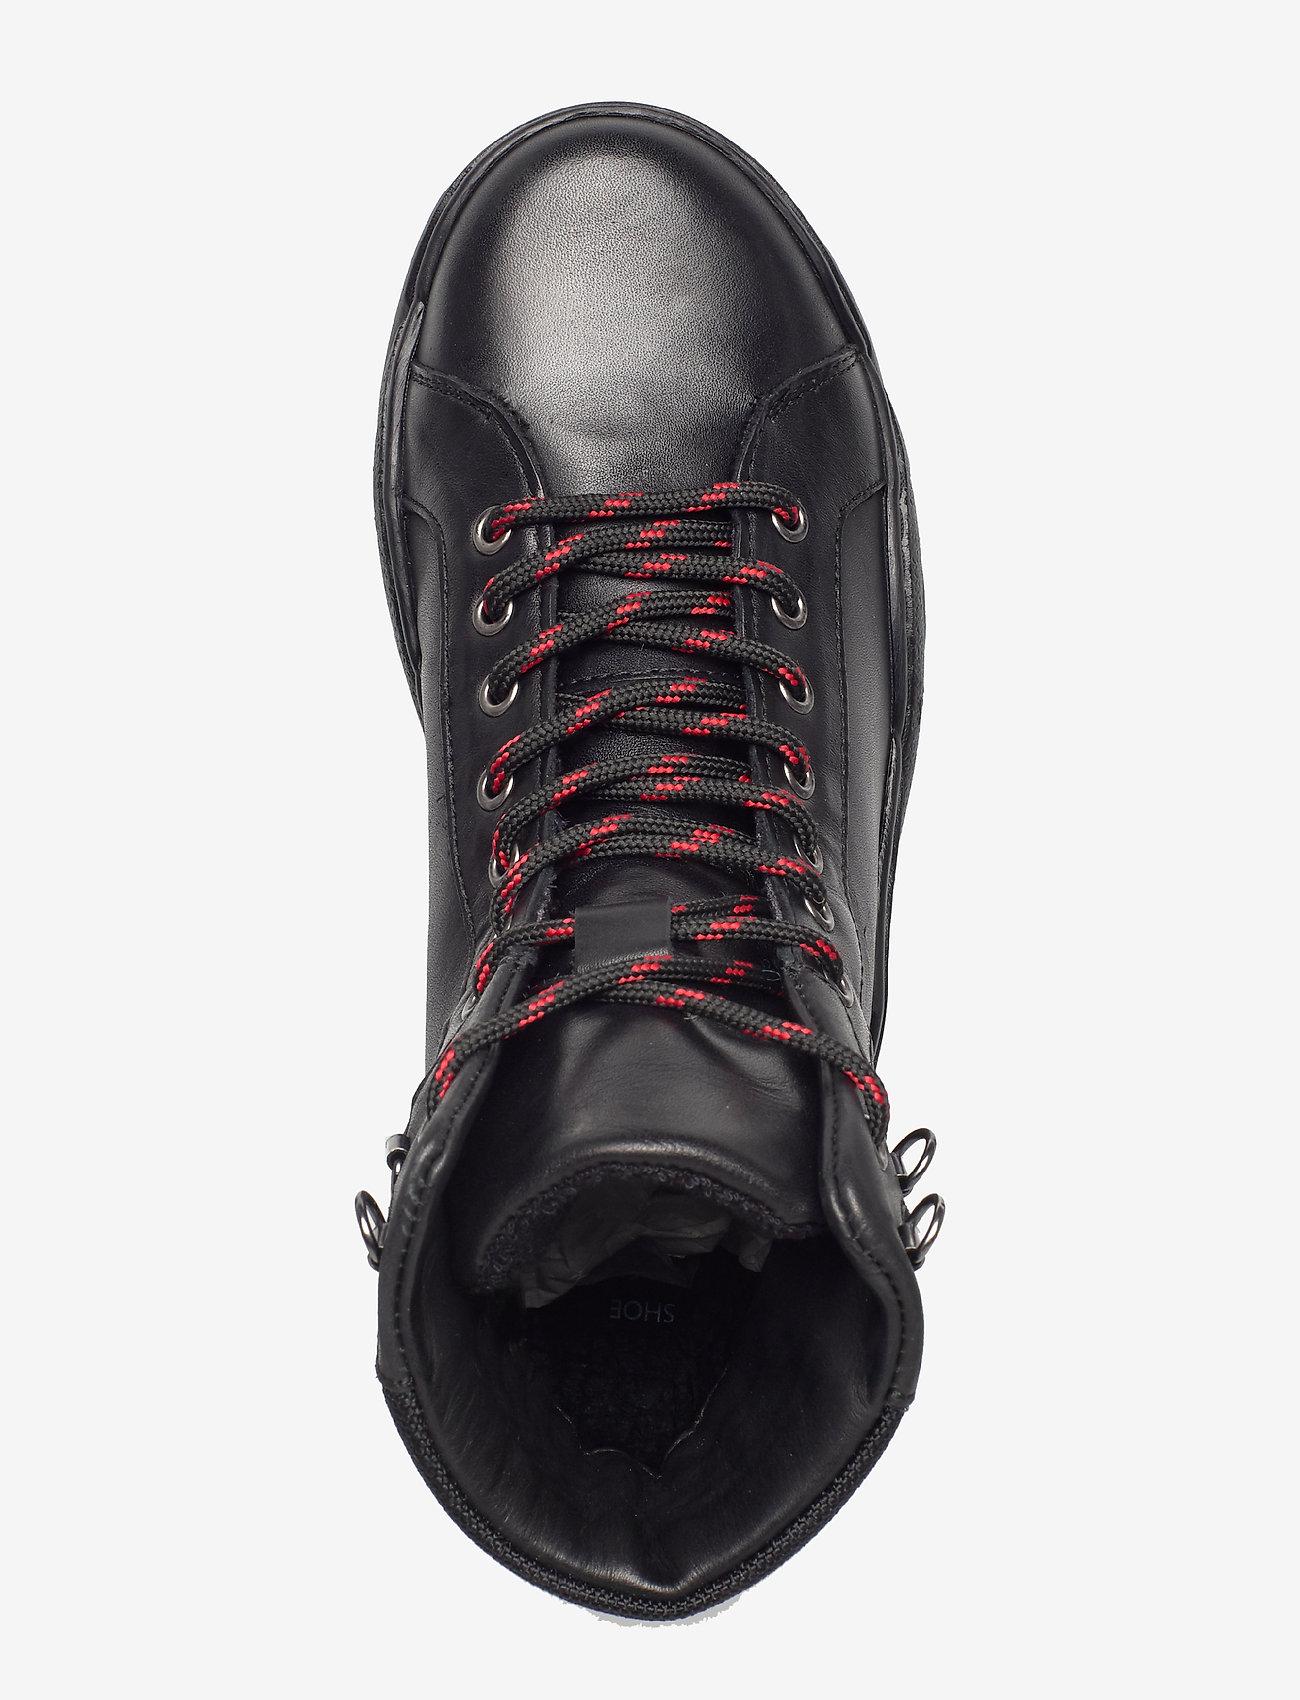 Iceman Hike L (Black) - Shoe The Bear